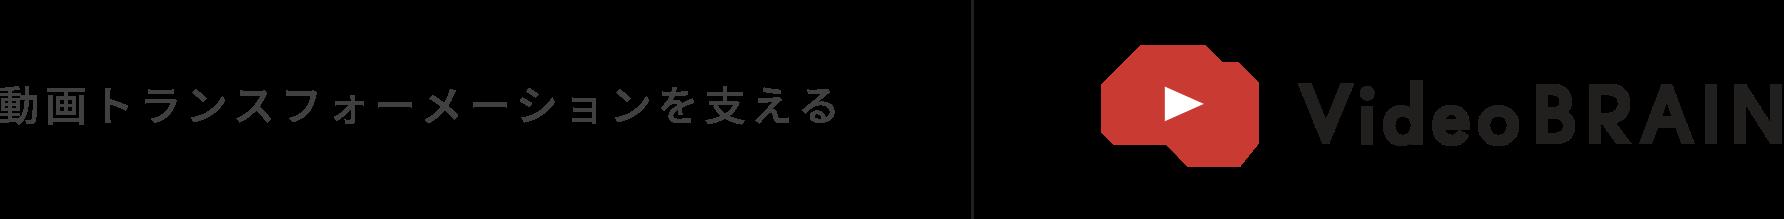 Video BRAIN インハウス動画編集クラウド